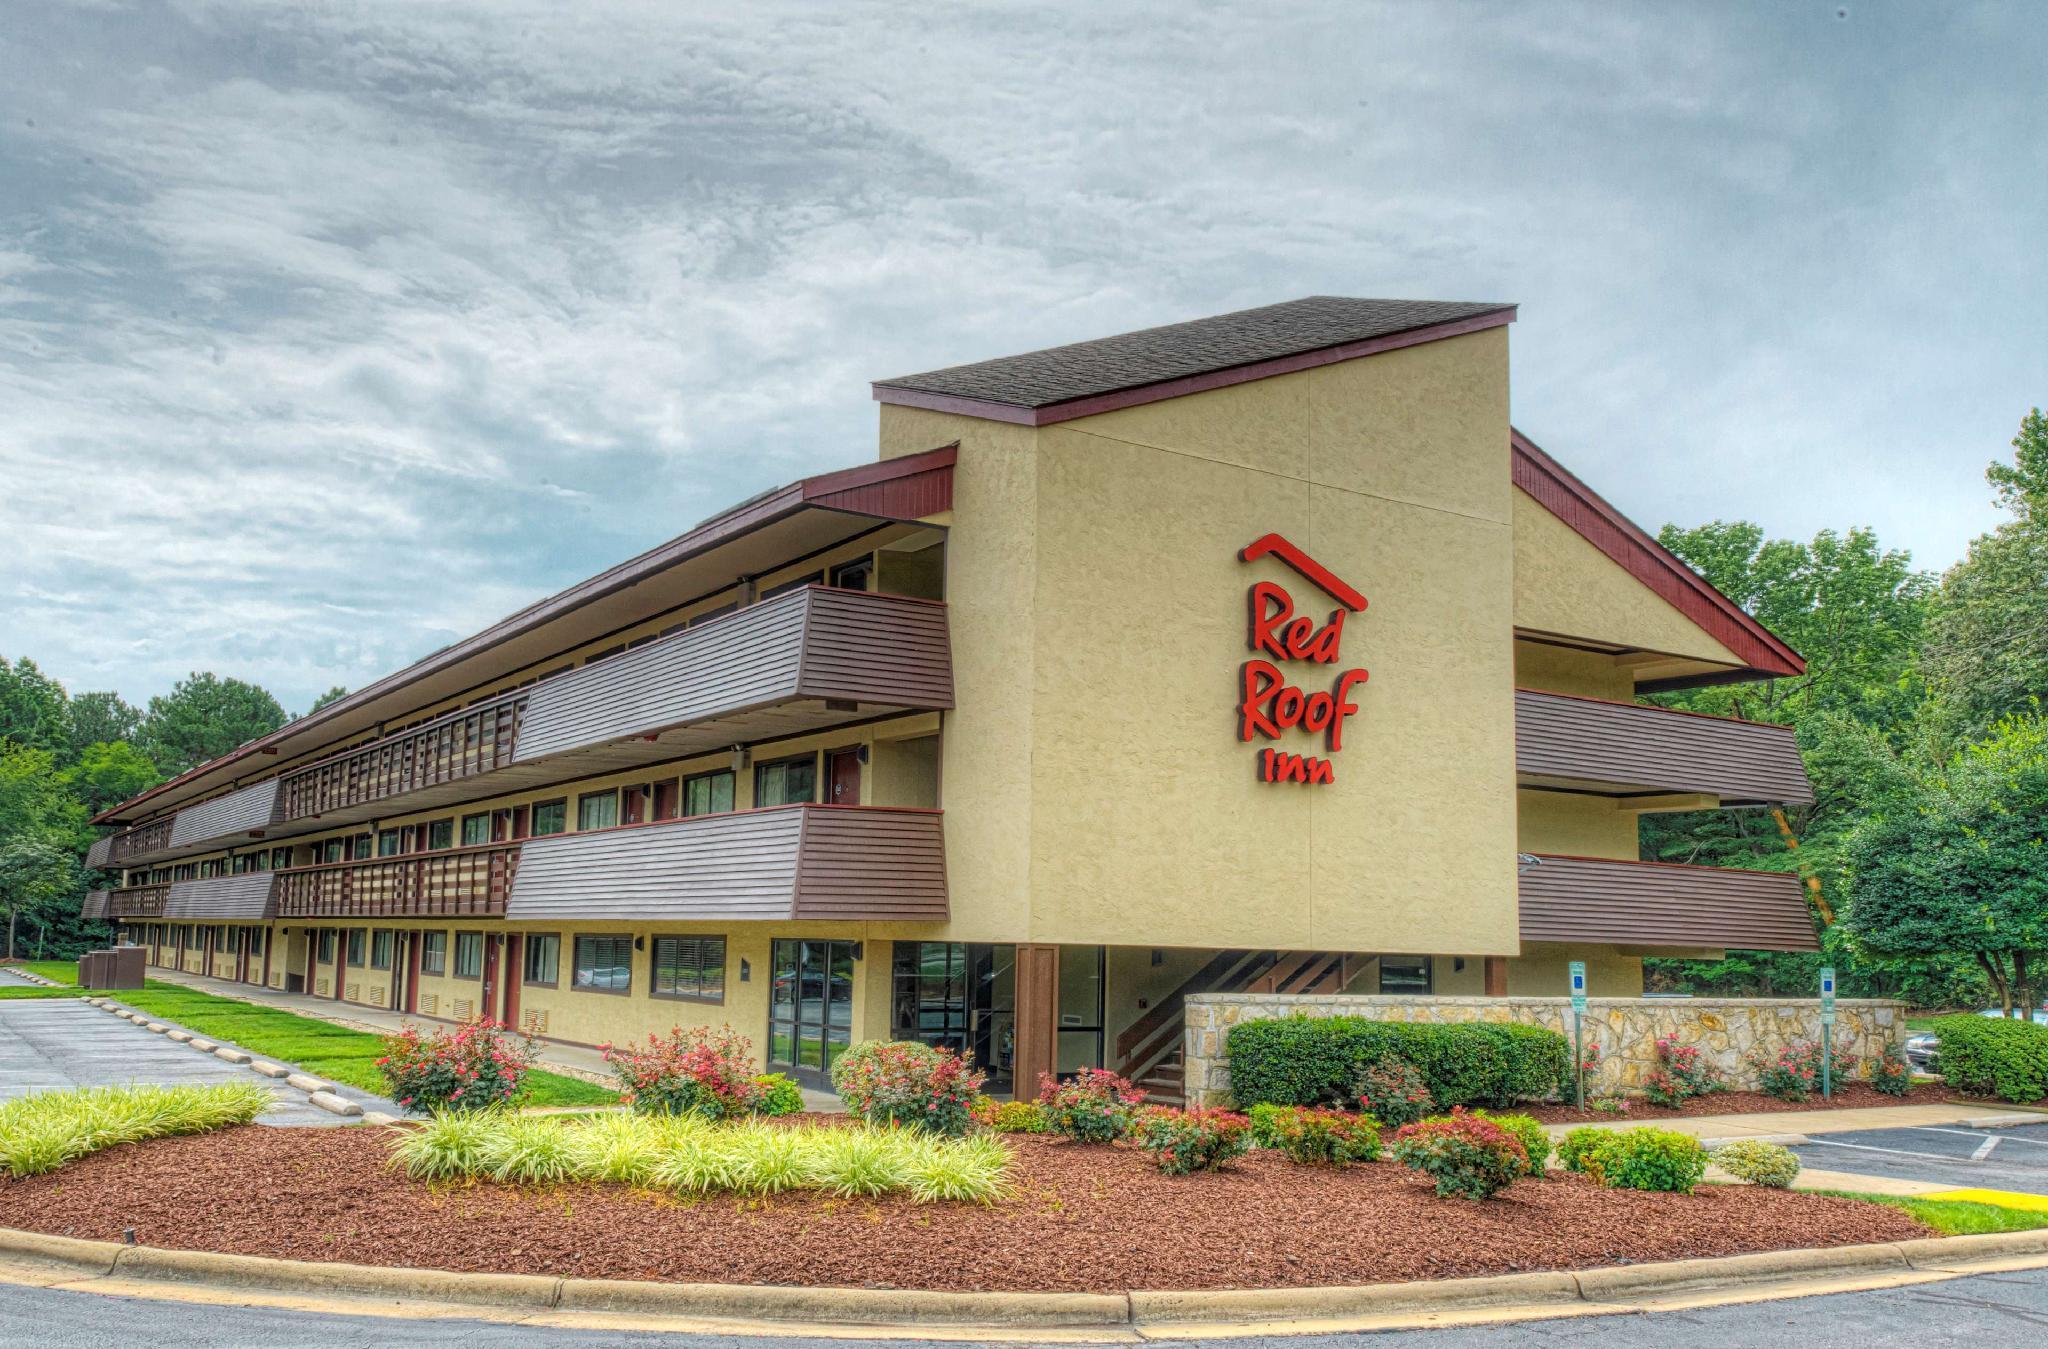 Red Roof Inn Chapel Hill - UNC Chapel Hill